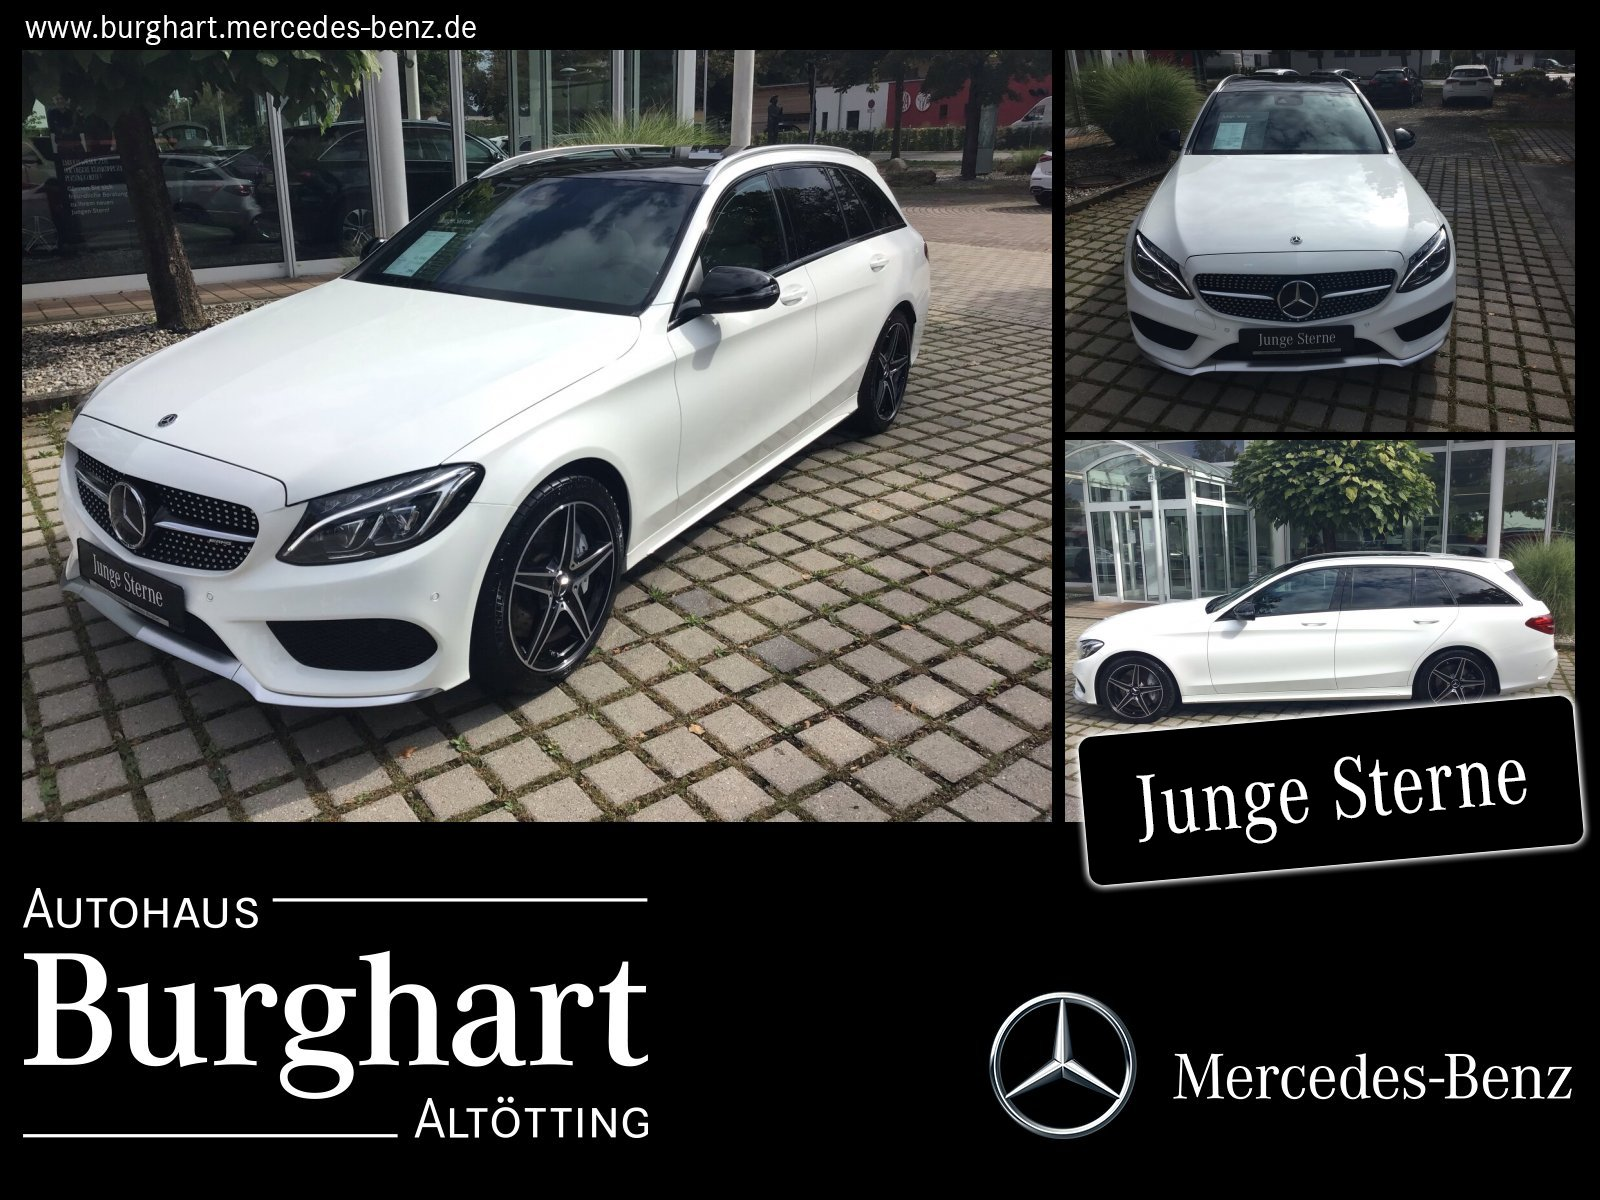 Mercedes-Benz Mercedes-AMG C 43 T 4M Business/COMAND/PanoDach, Jahr 2017, Benzin